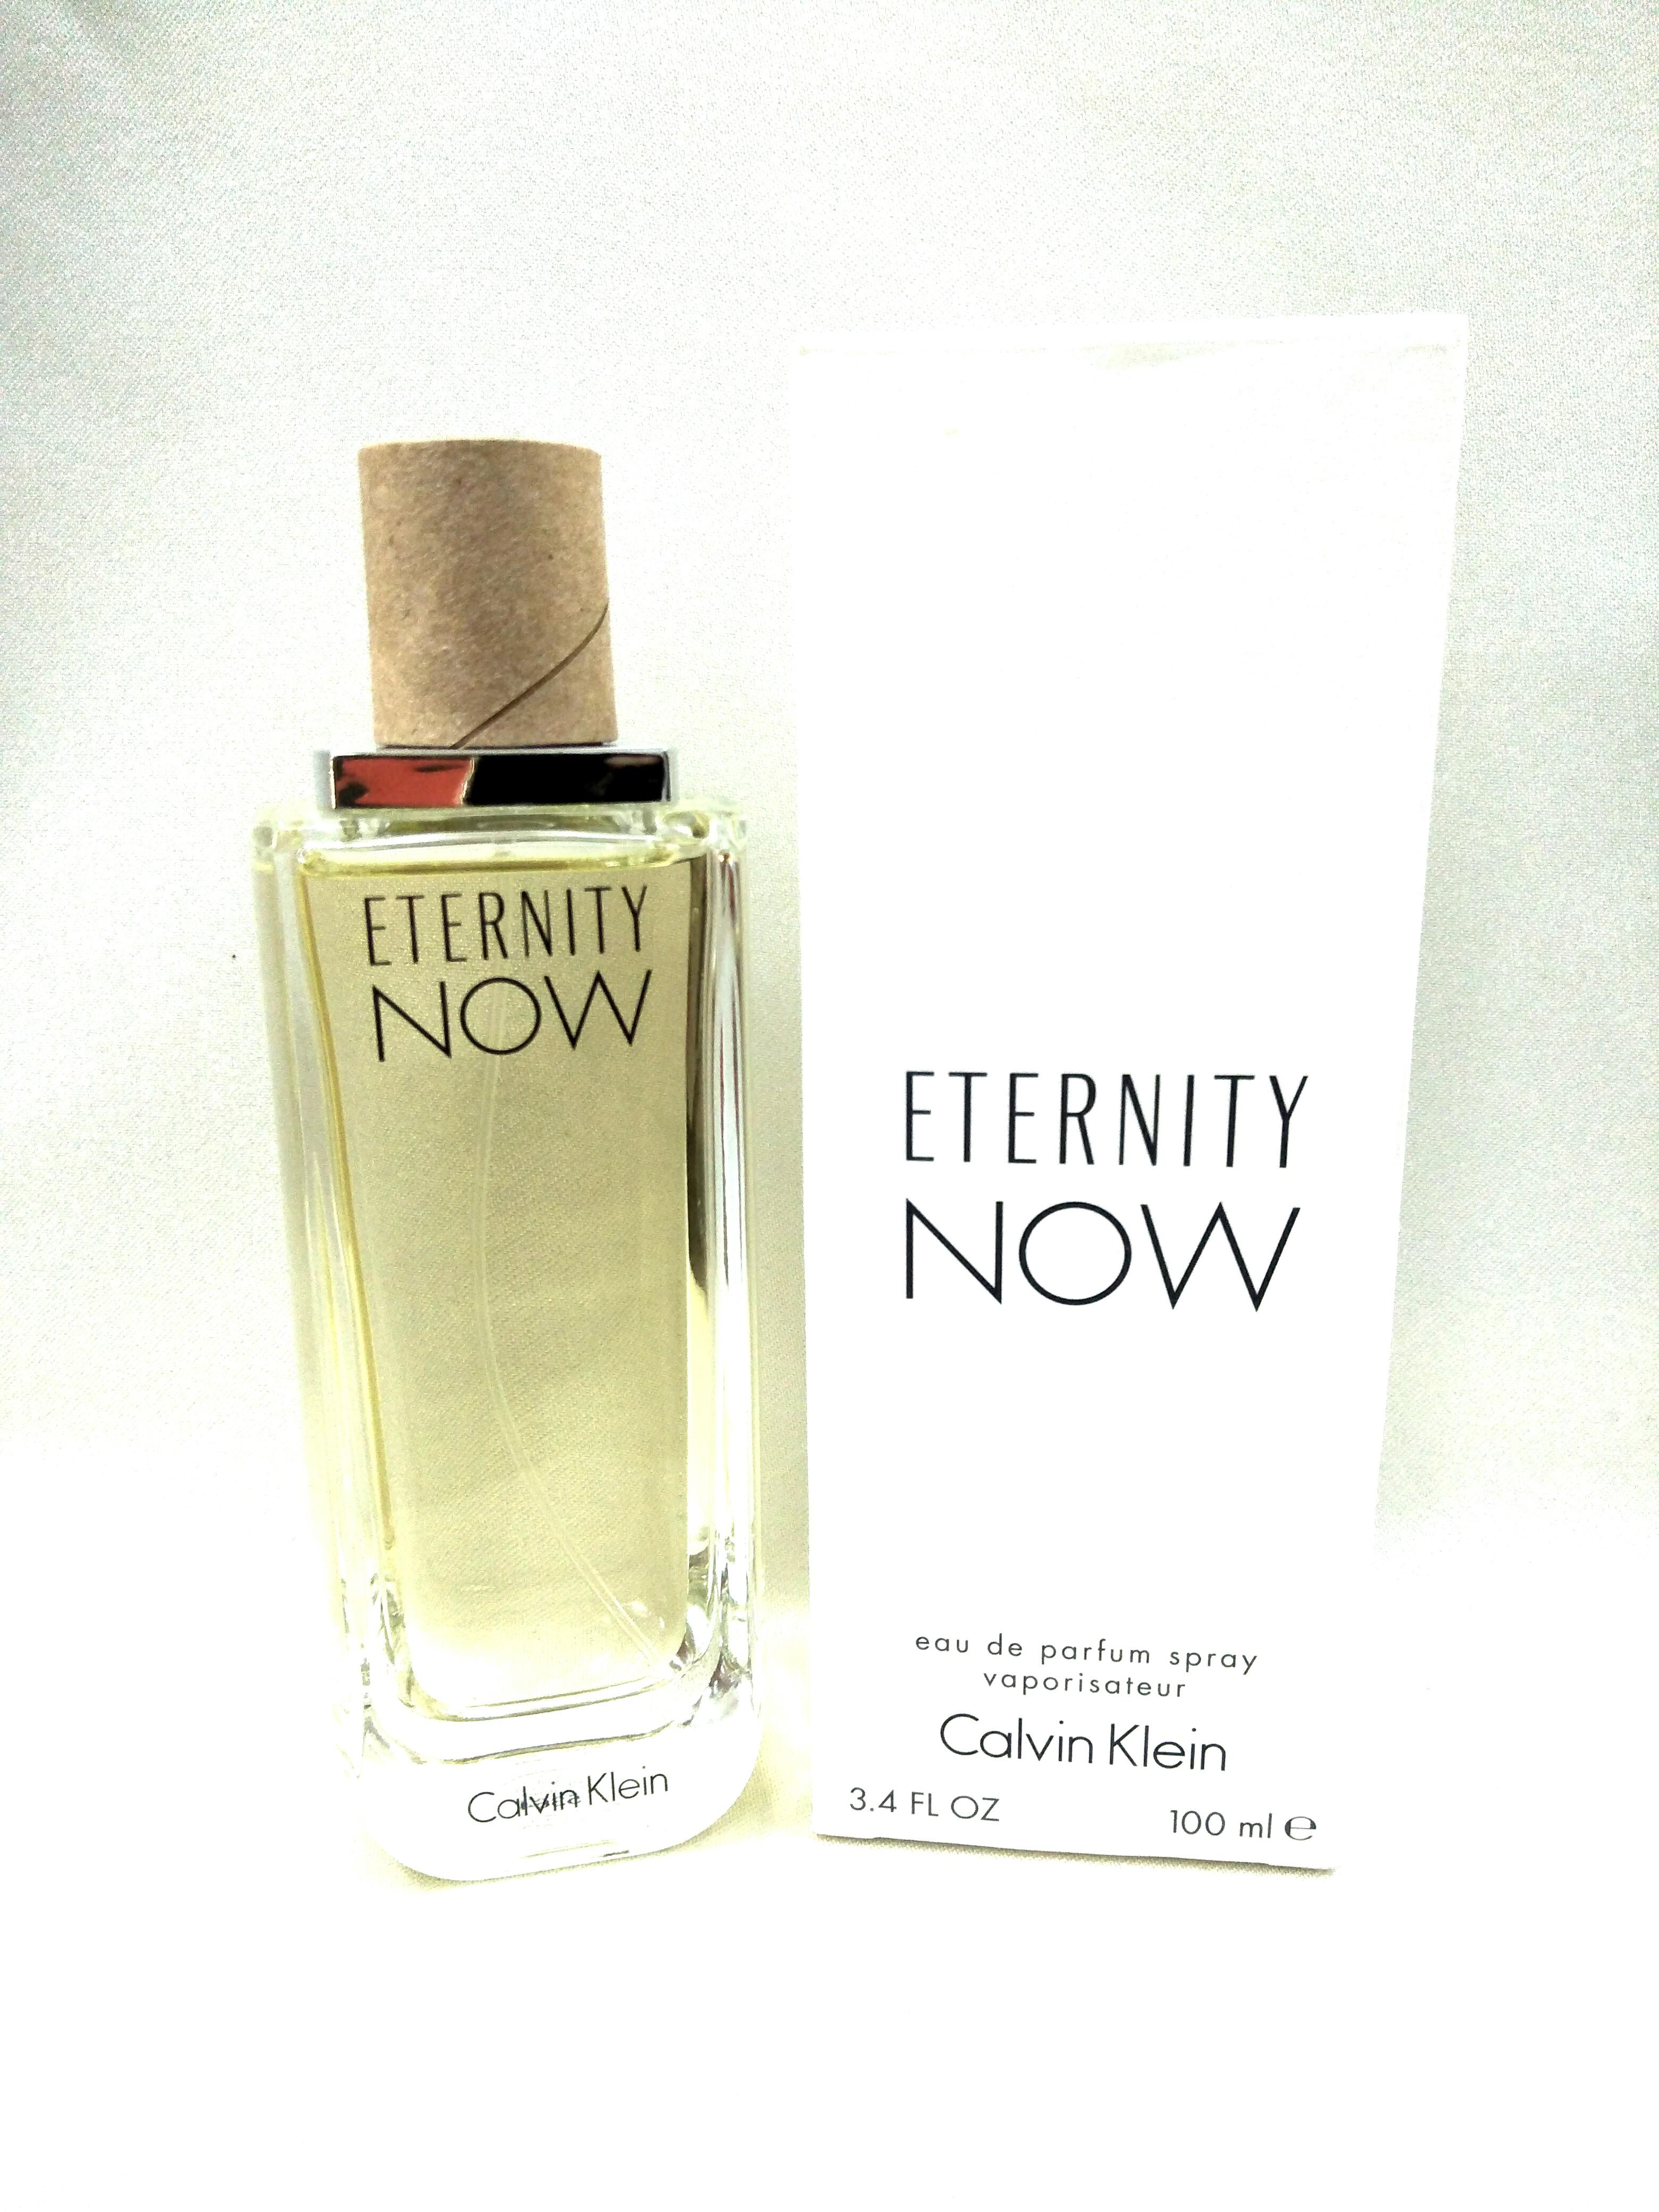 Calvin Klein Eternity Now Edp Perfume 100ml Tester Pack Health